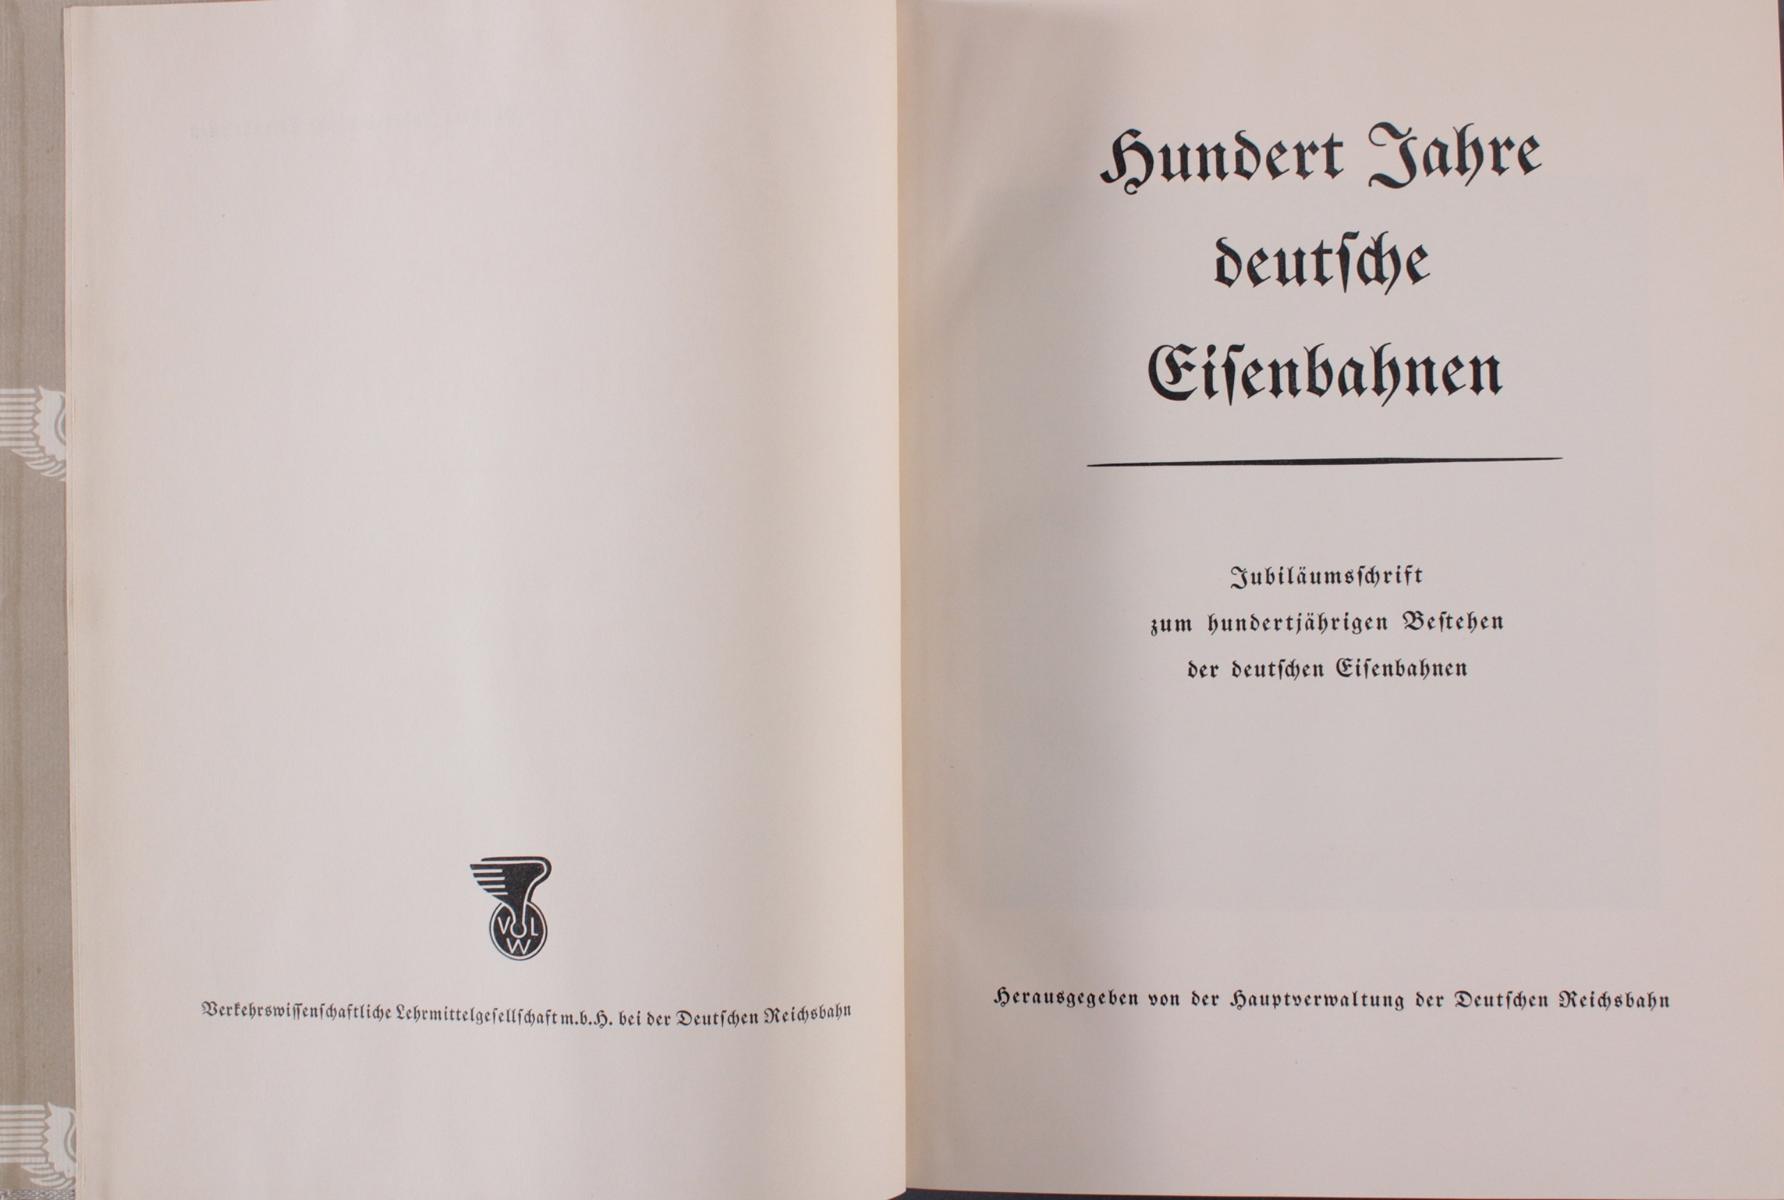 Hundert Jahre deutsche Eisenbahn, Jubiläumsschrift zum hundertjährigen Bestehen-2